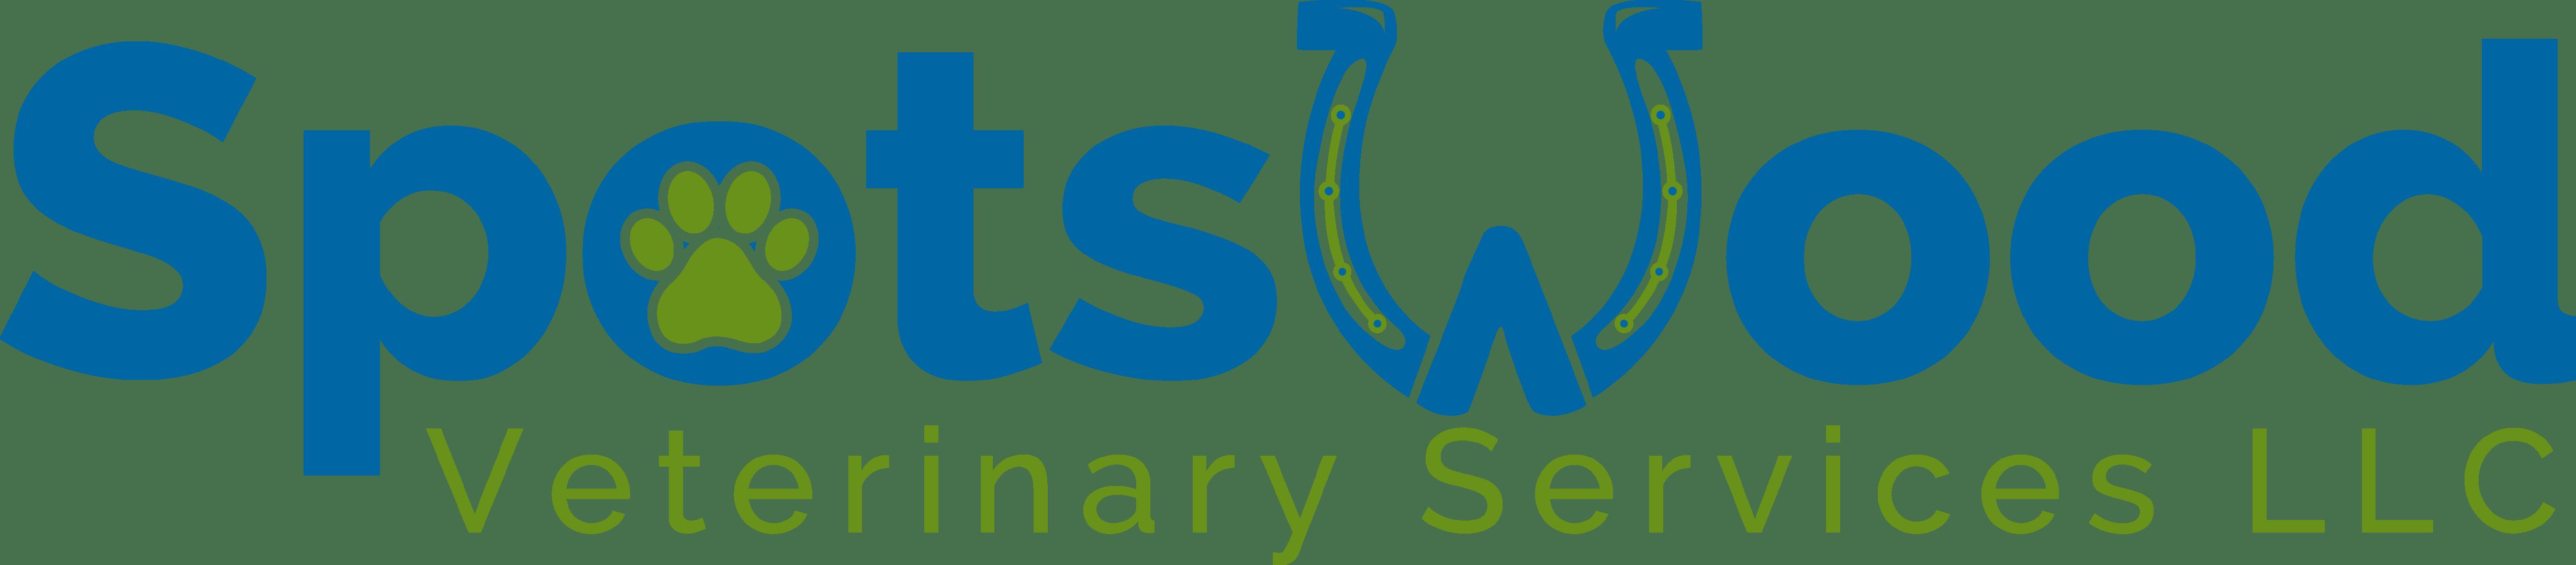 Spotswood Veterinary Services LLC